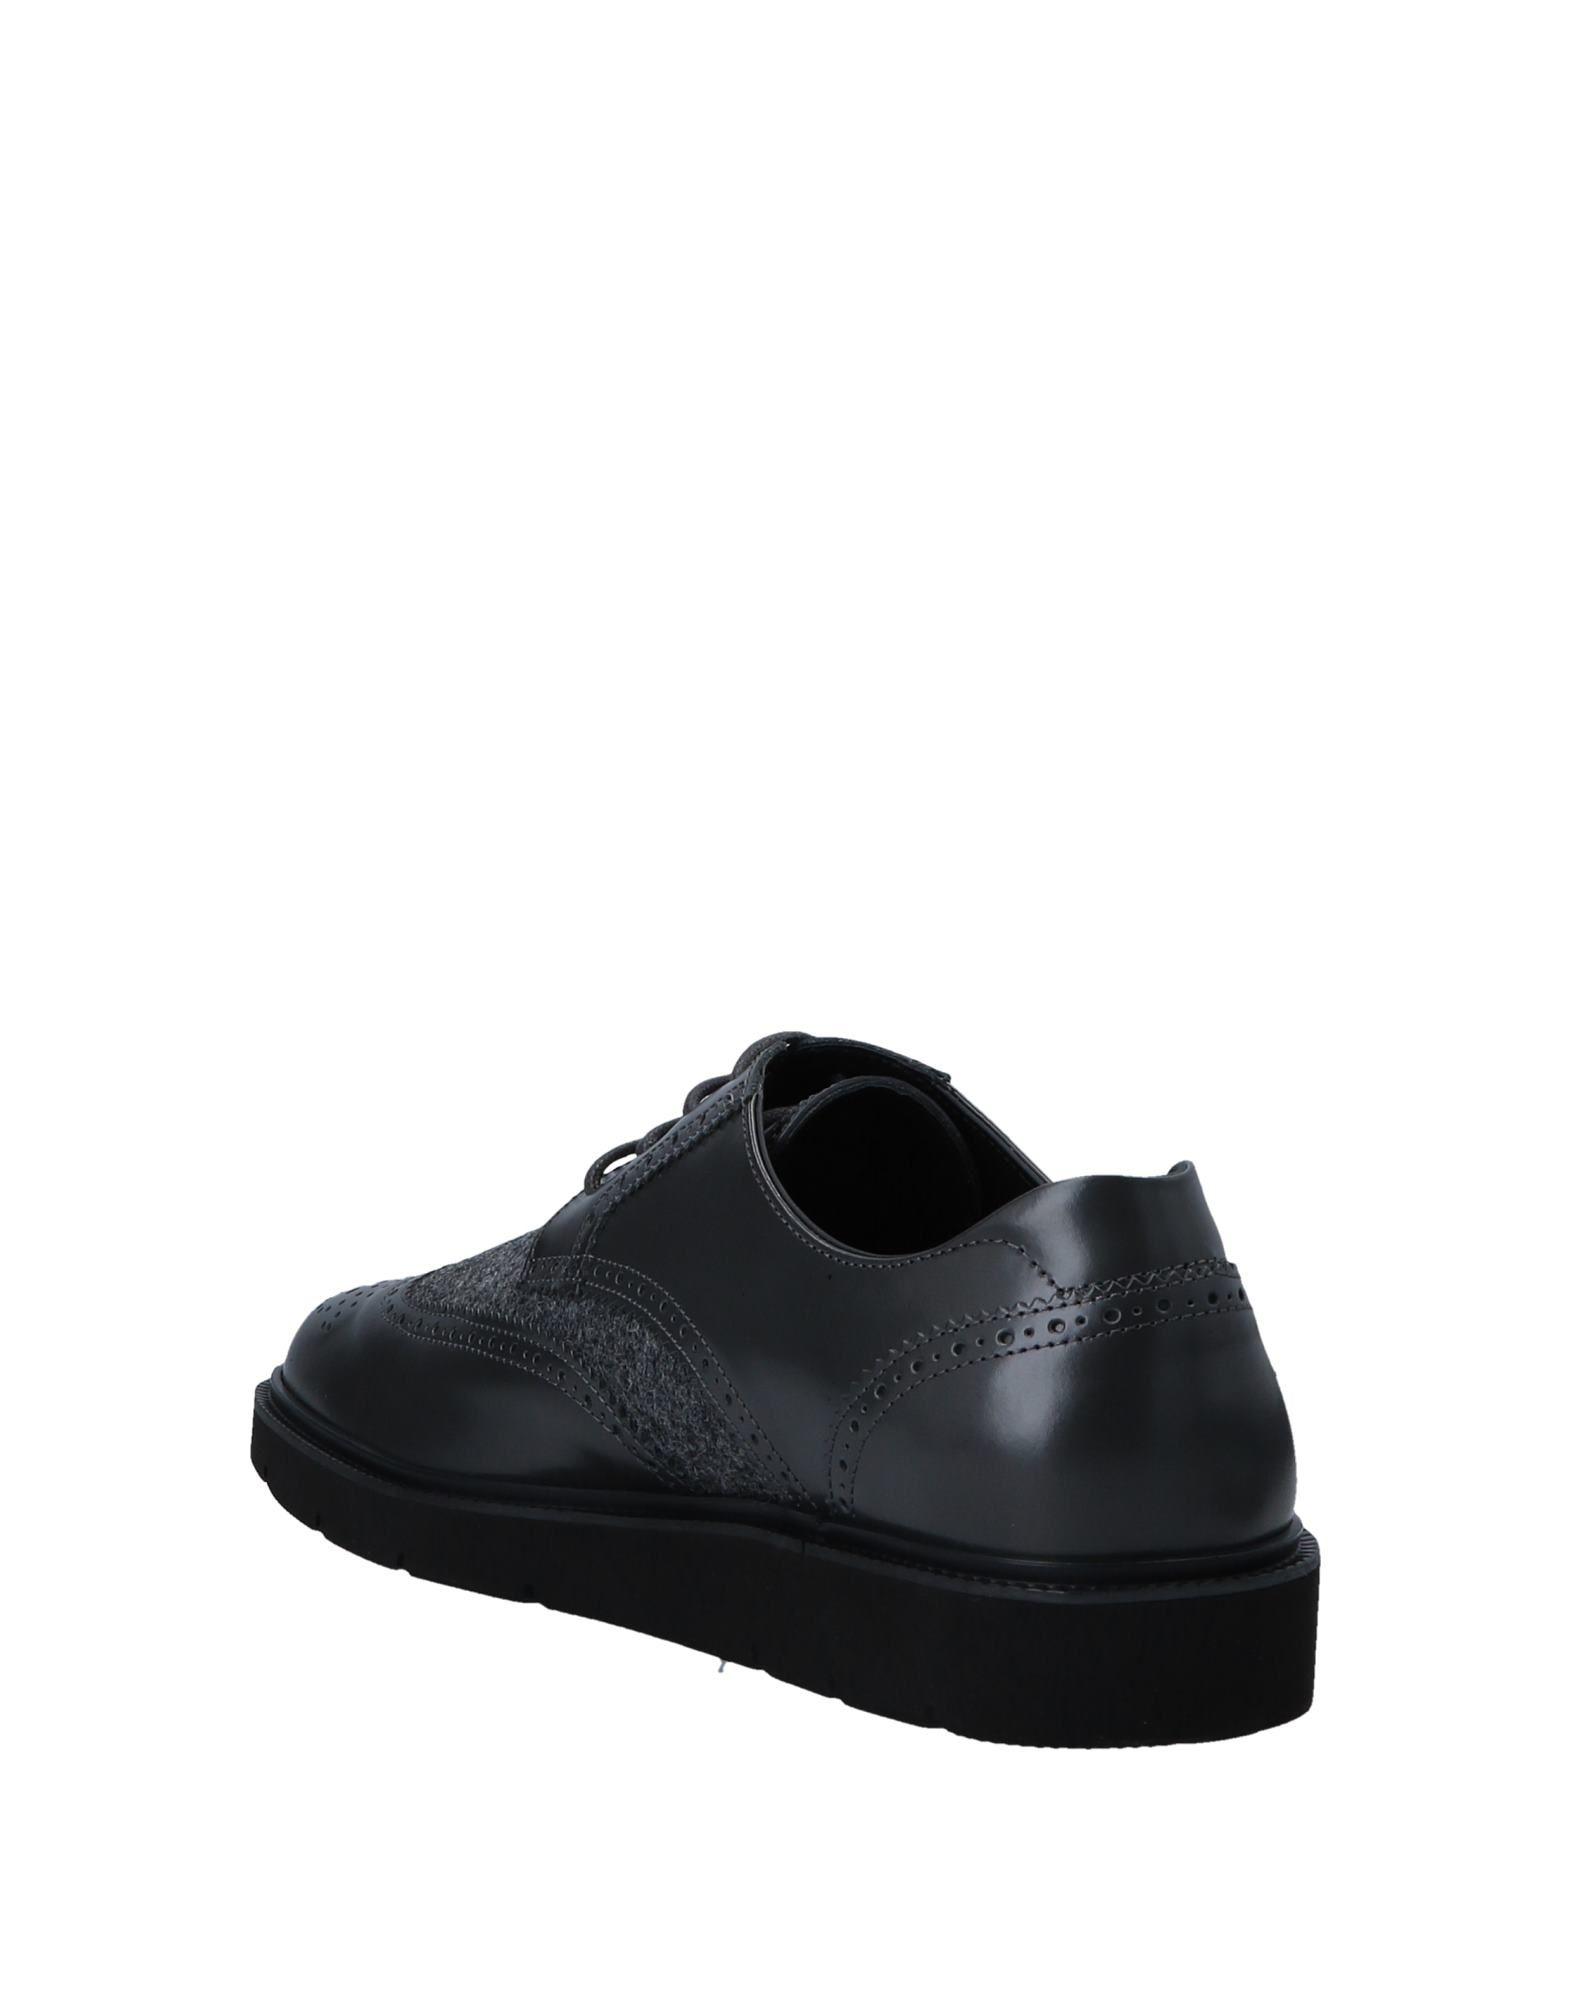 Hogan Schnürschuhe Herren  Schuhe 11560204TI Gute Qualität beliebte Schuhe  ee5fb0